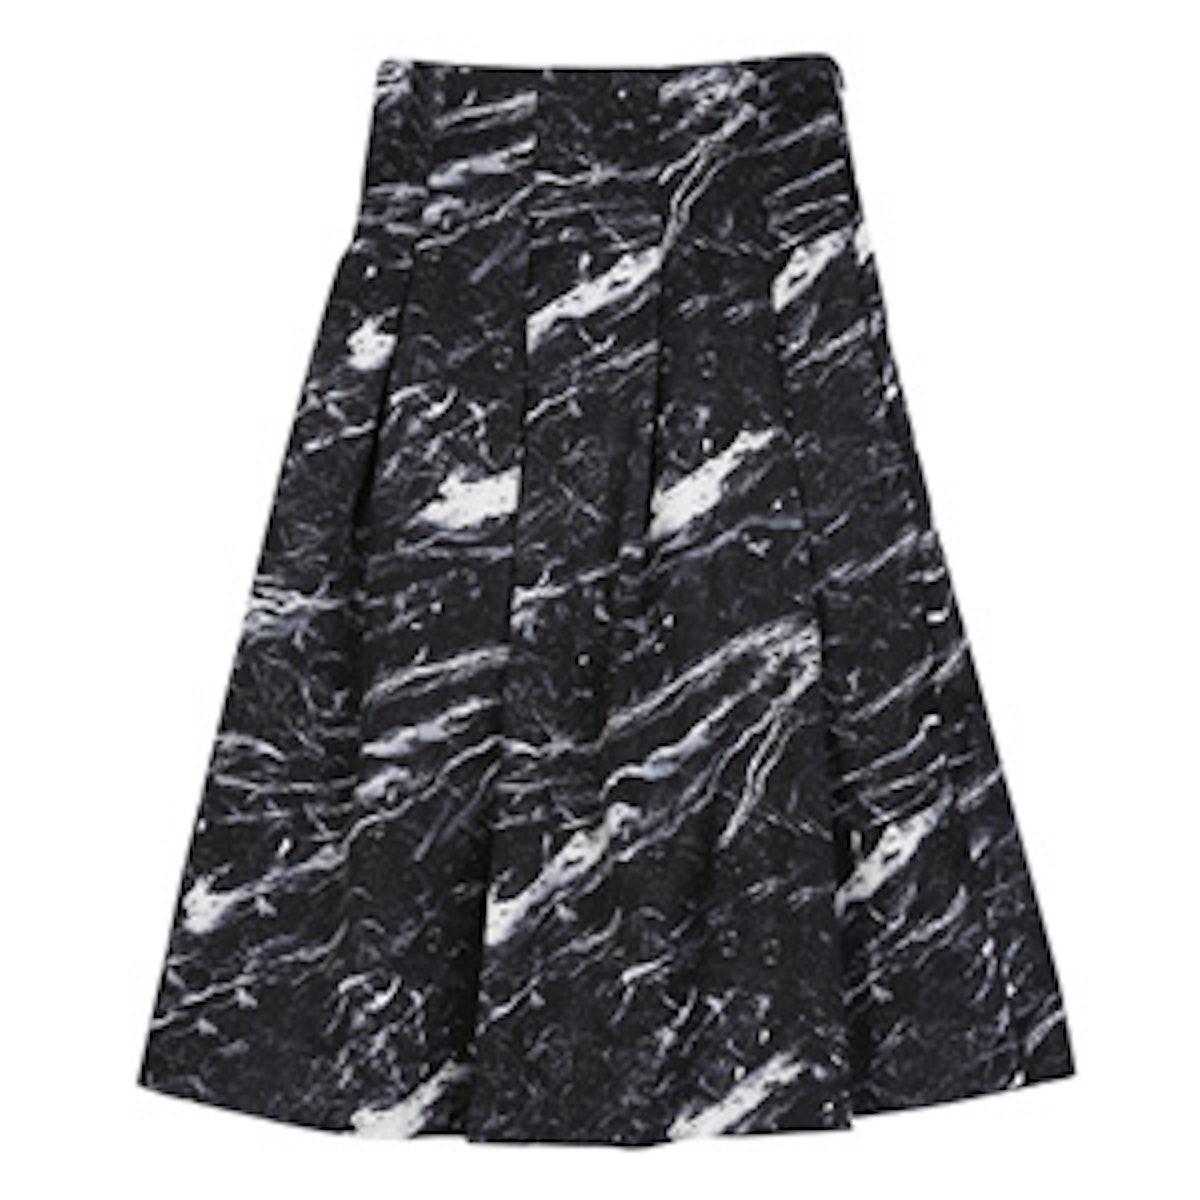 High-Waist Marble Print Skirt